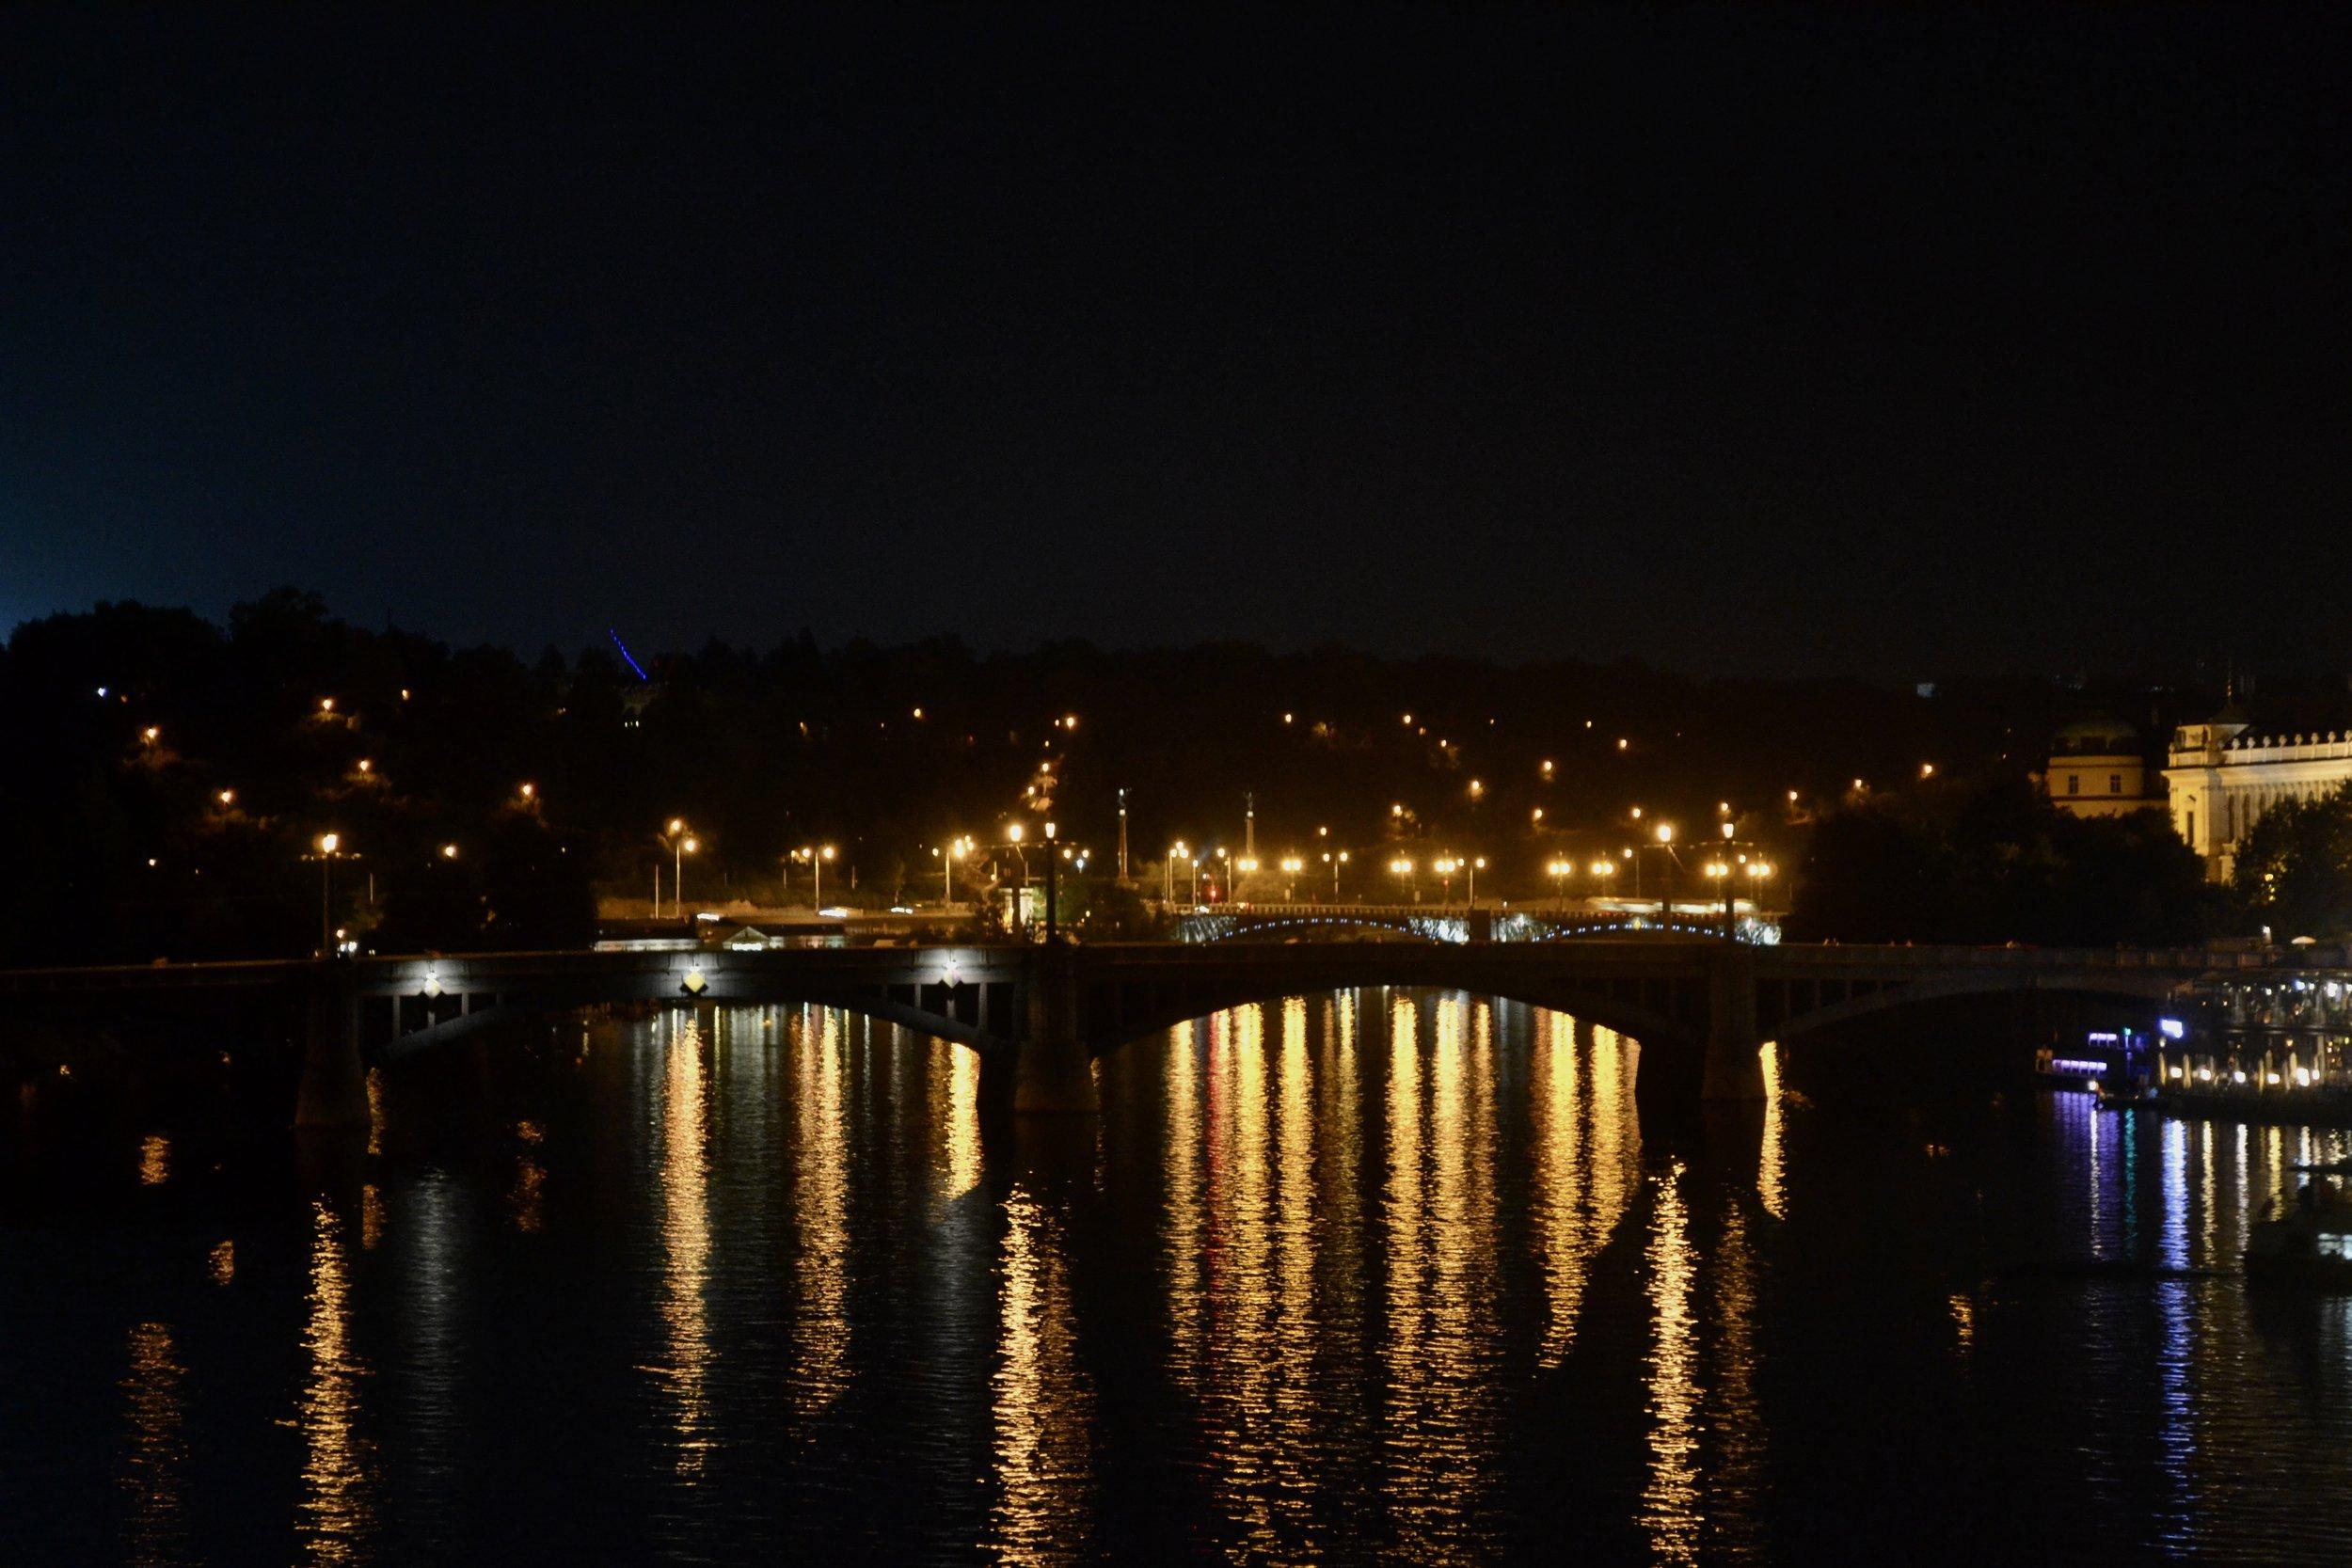 Charles Street Bridge after sunset